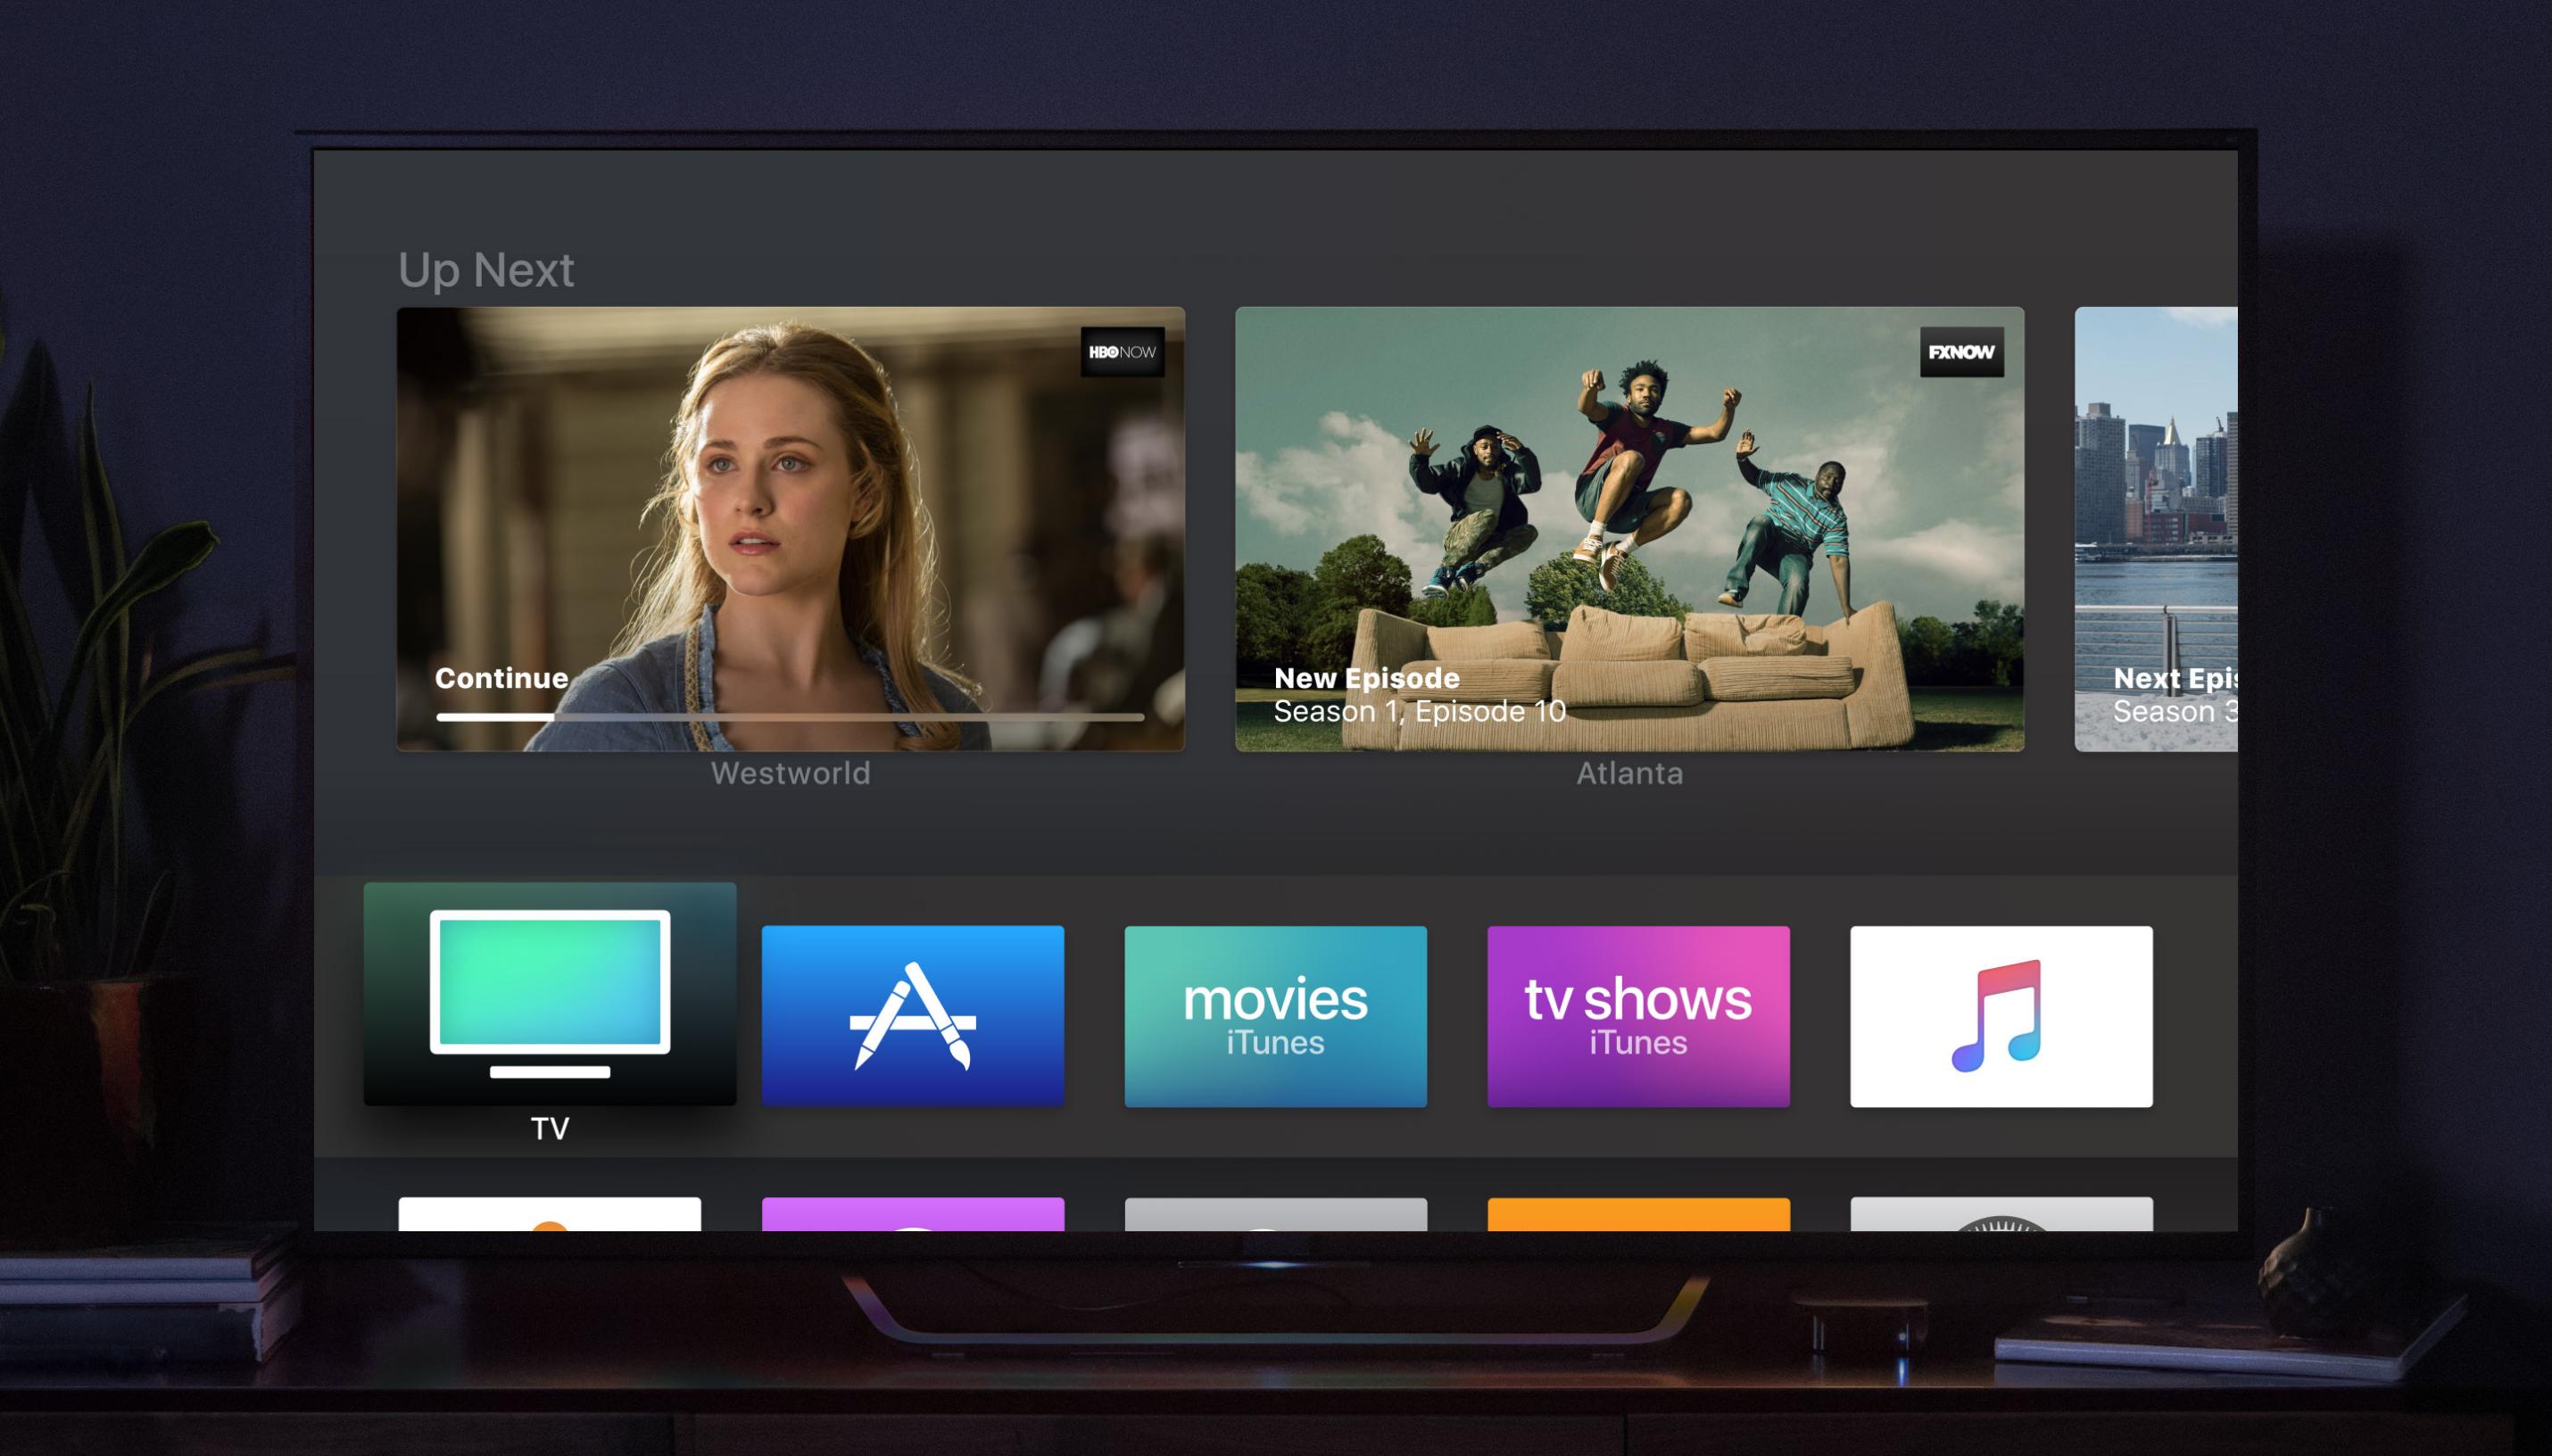 Apple tvOS interface displayed on a TV